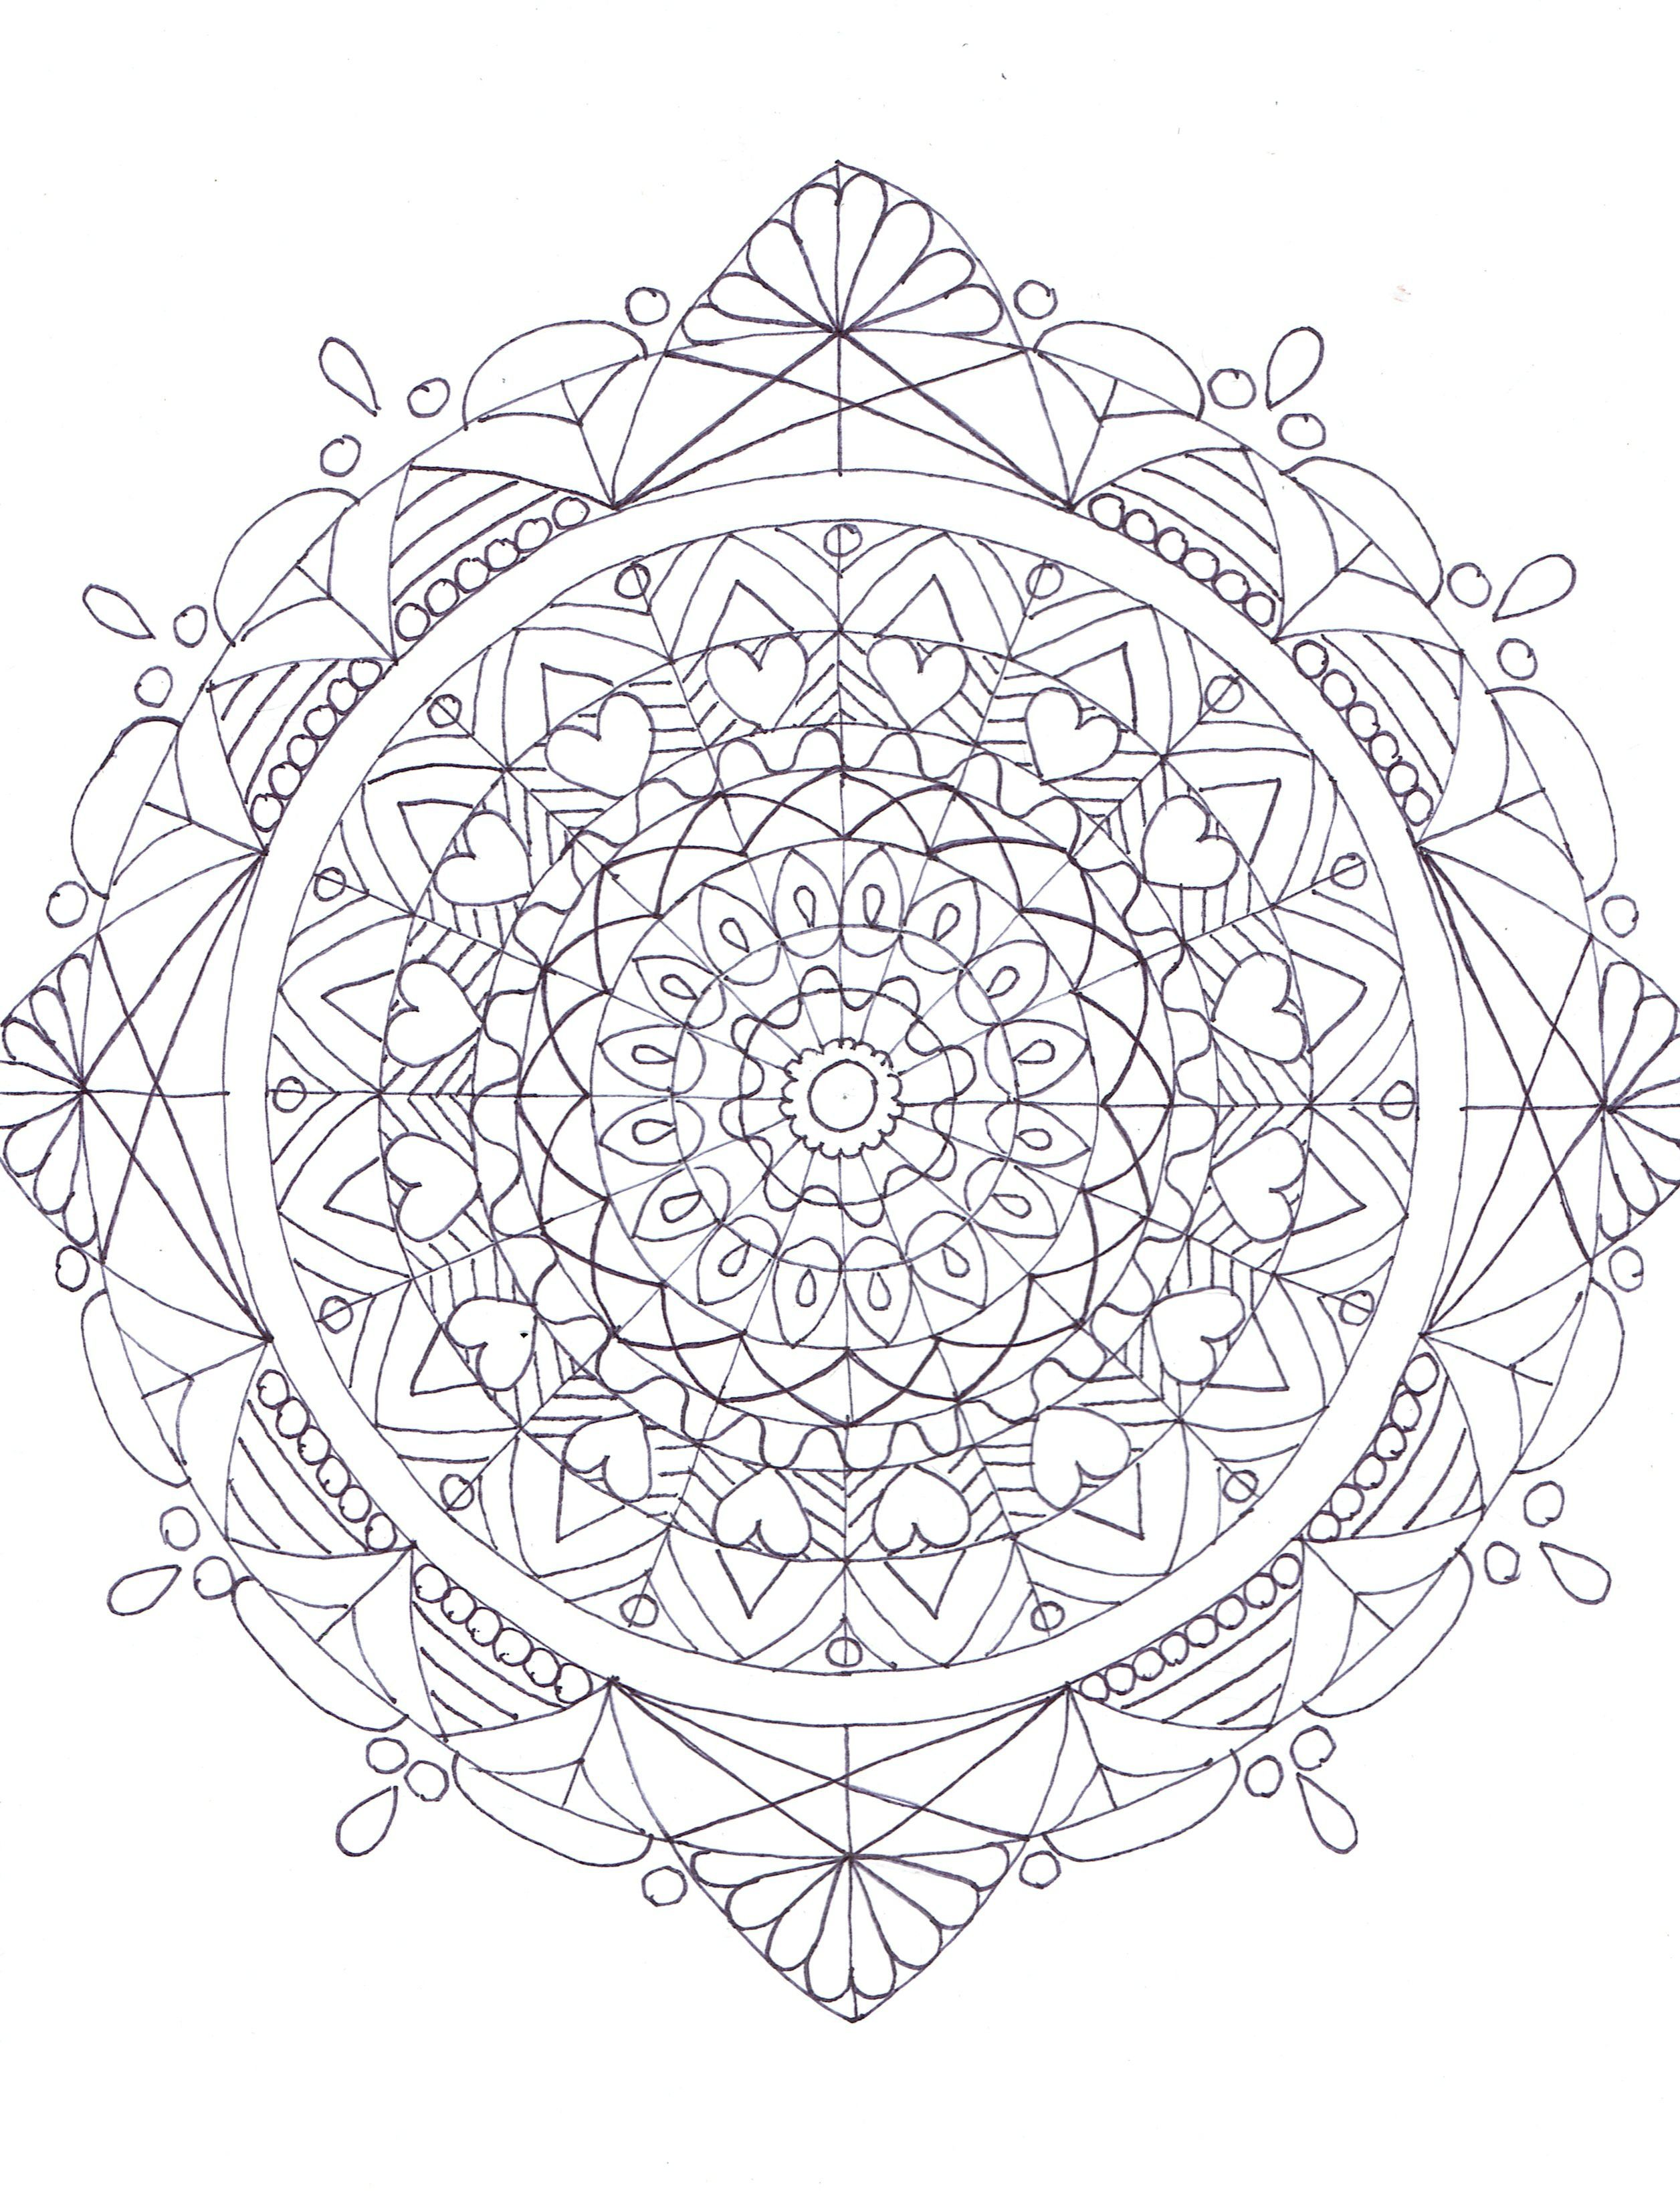 Mandala Coloring Page By Sw Mandalas Pinterest Mandala Sw Coloring Page